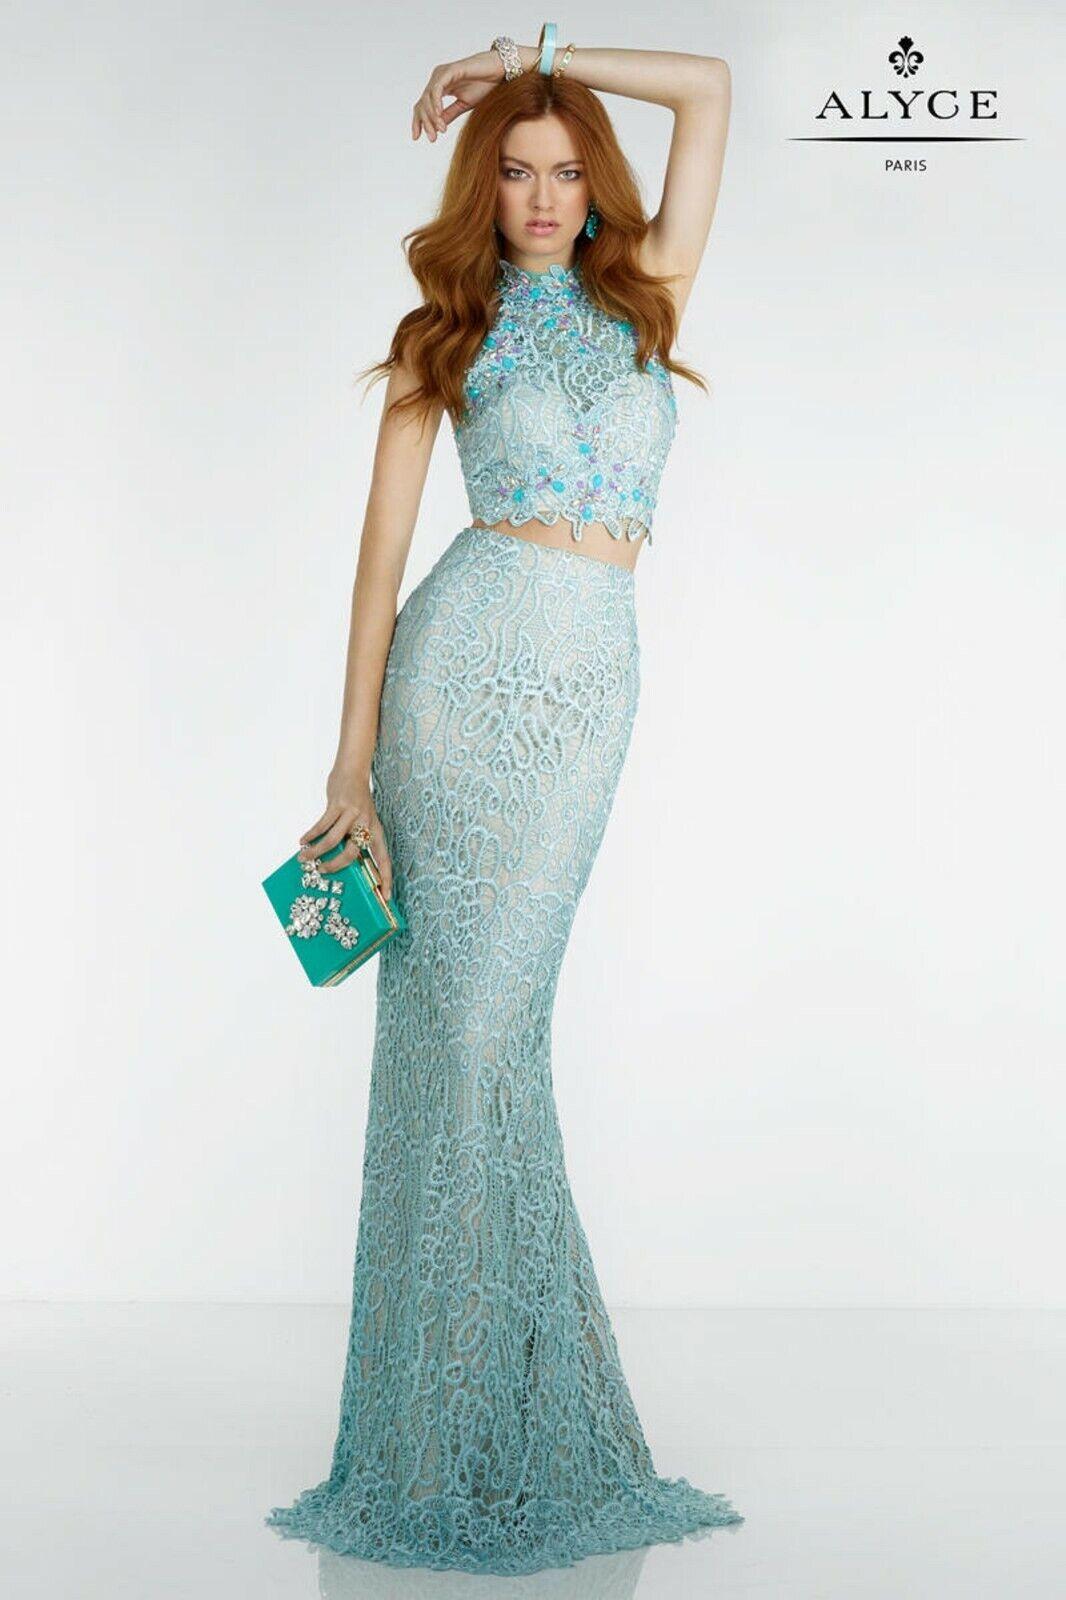 NWT Size 10 two piece lace jeweled formal gown Alyce Paris 6521 Aqua prom dress